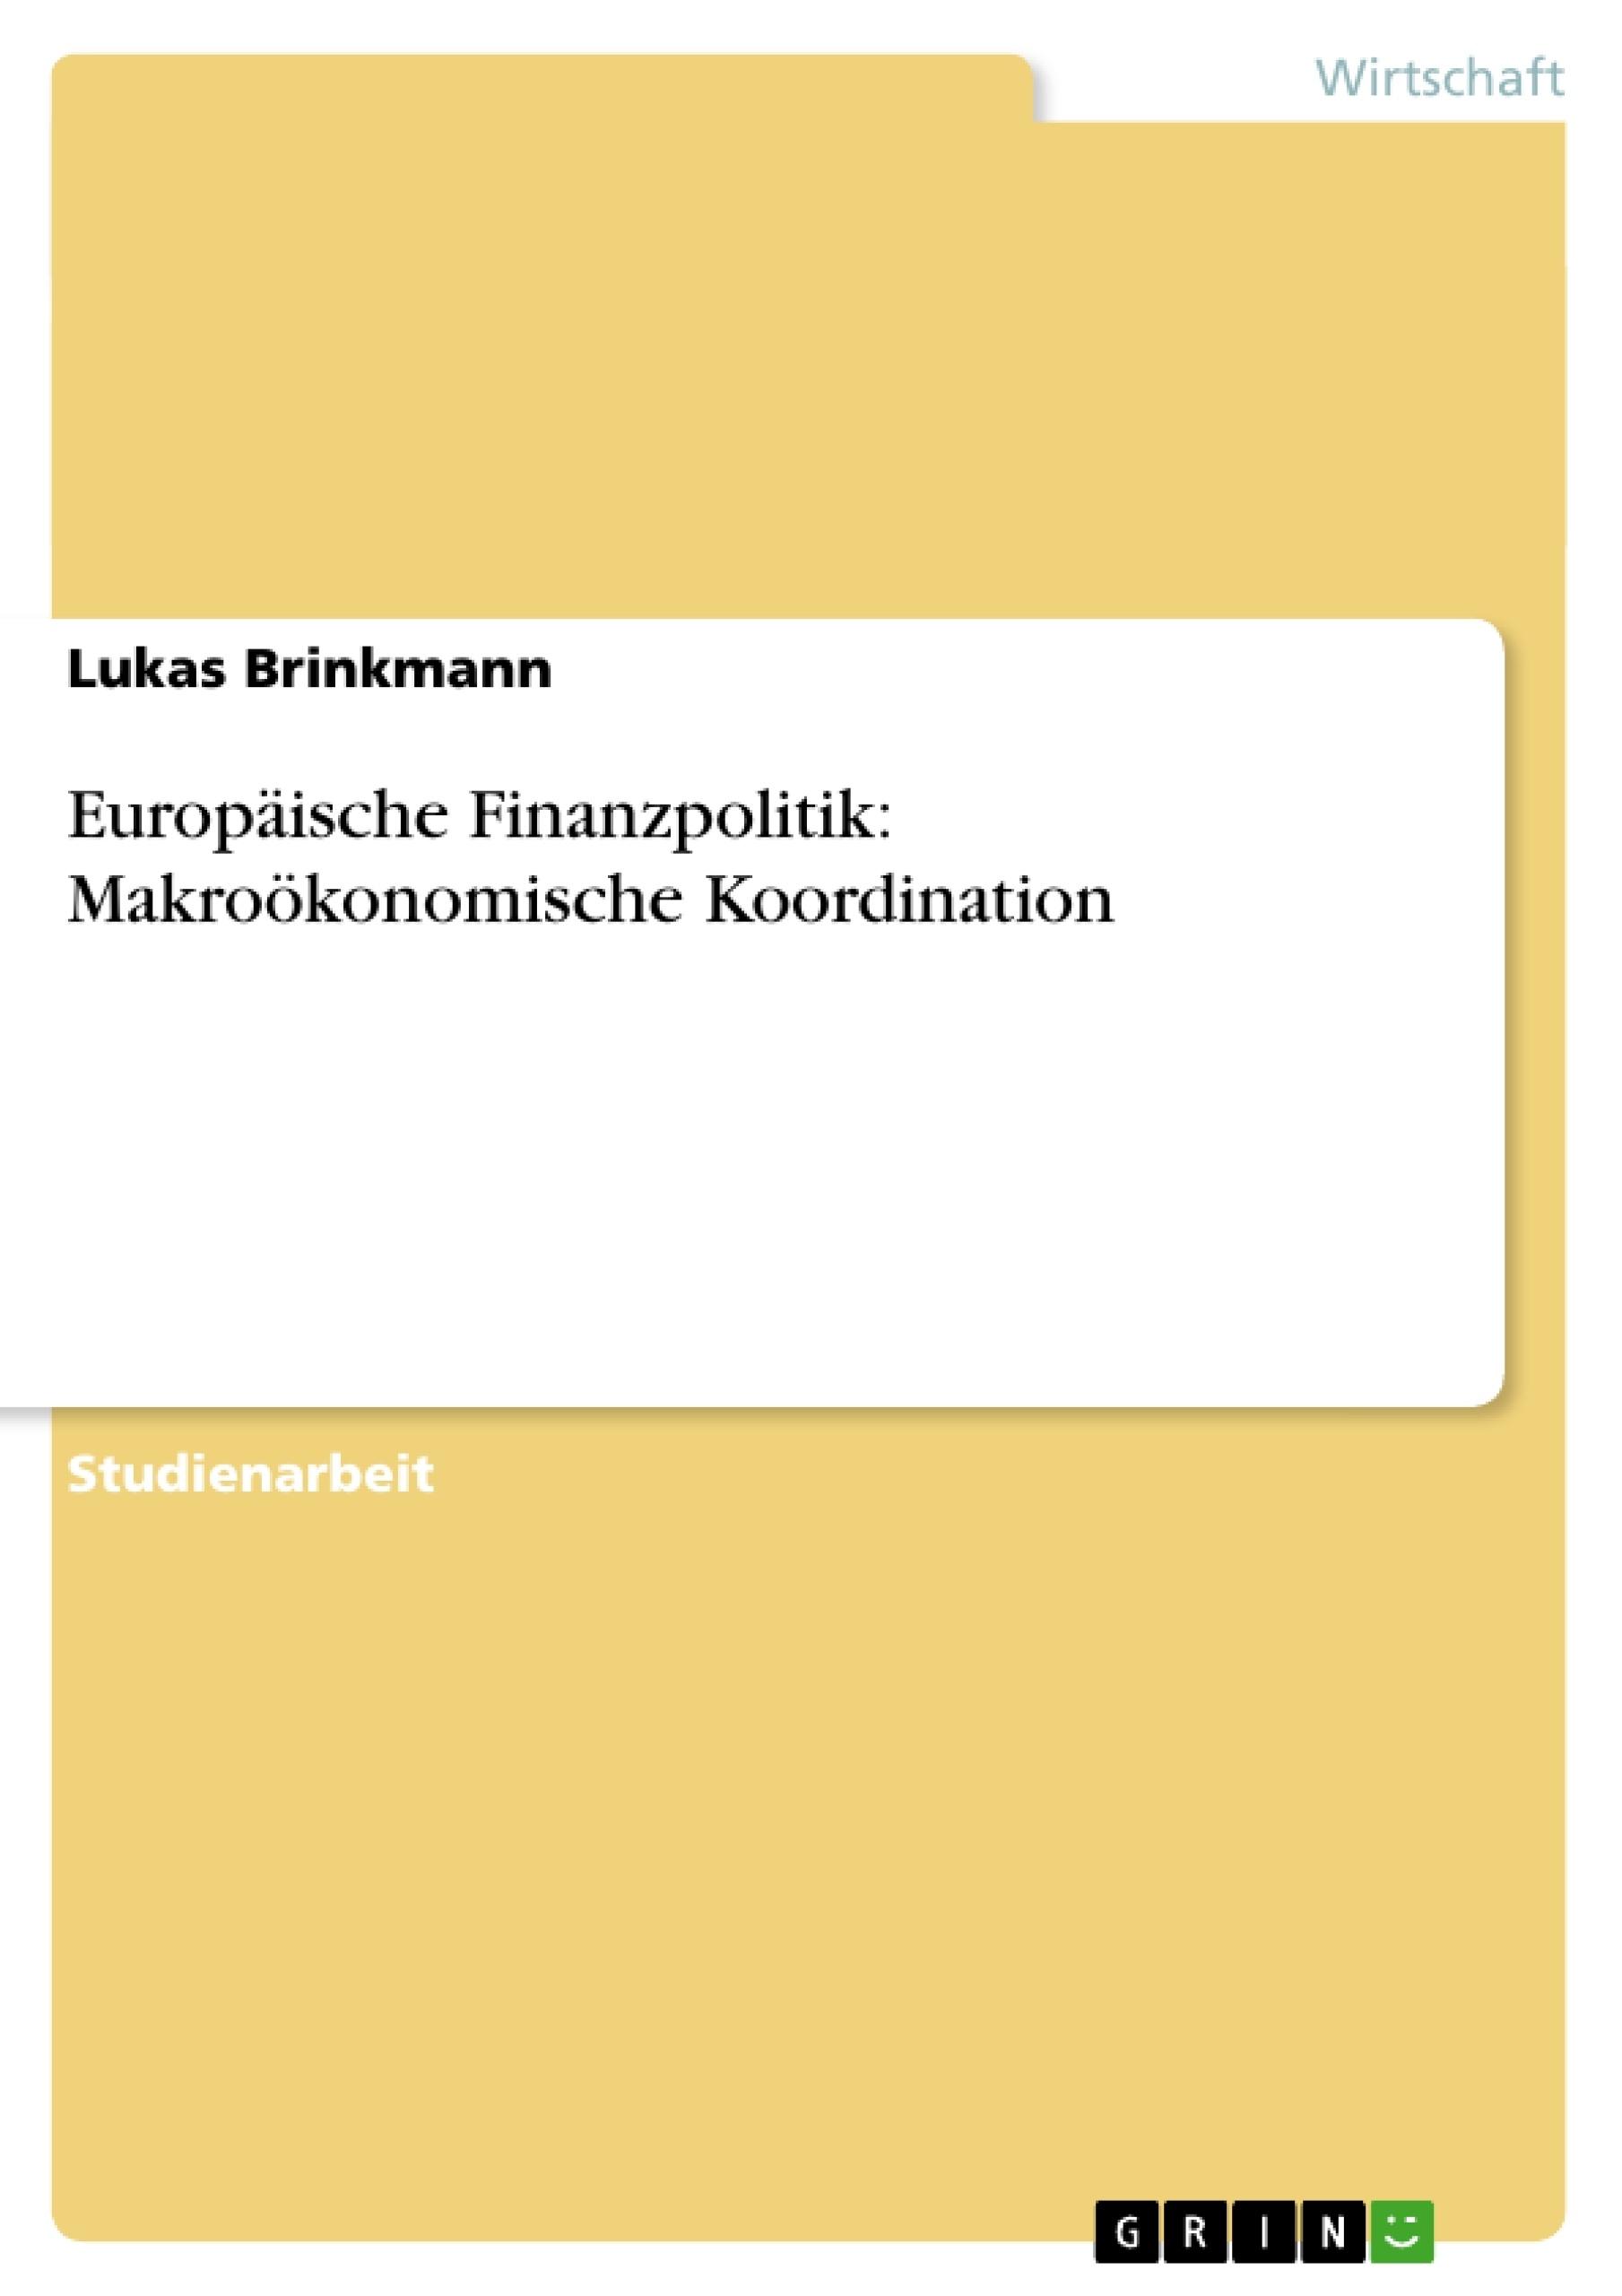 Titel: Europäische Finanzpolitik: Makroökonomische Koordination